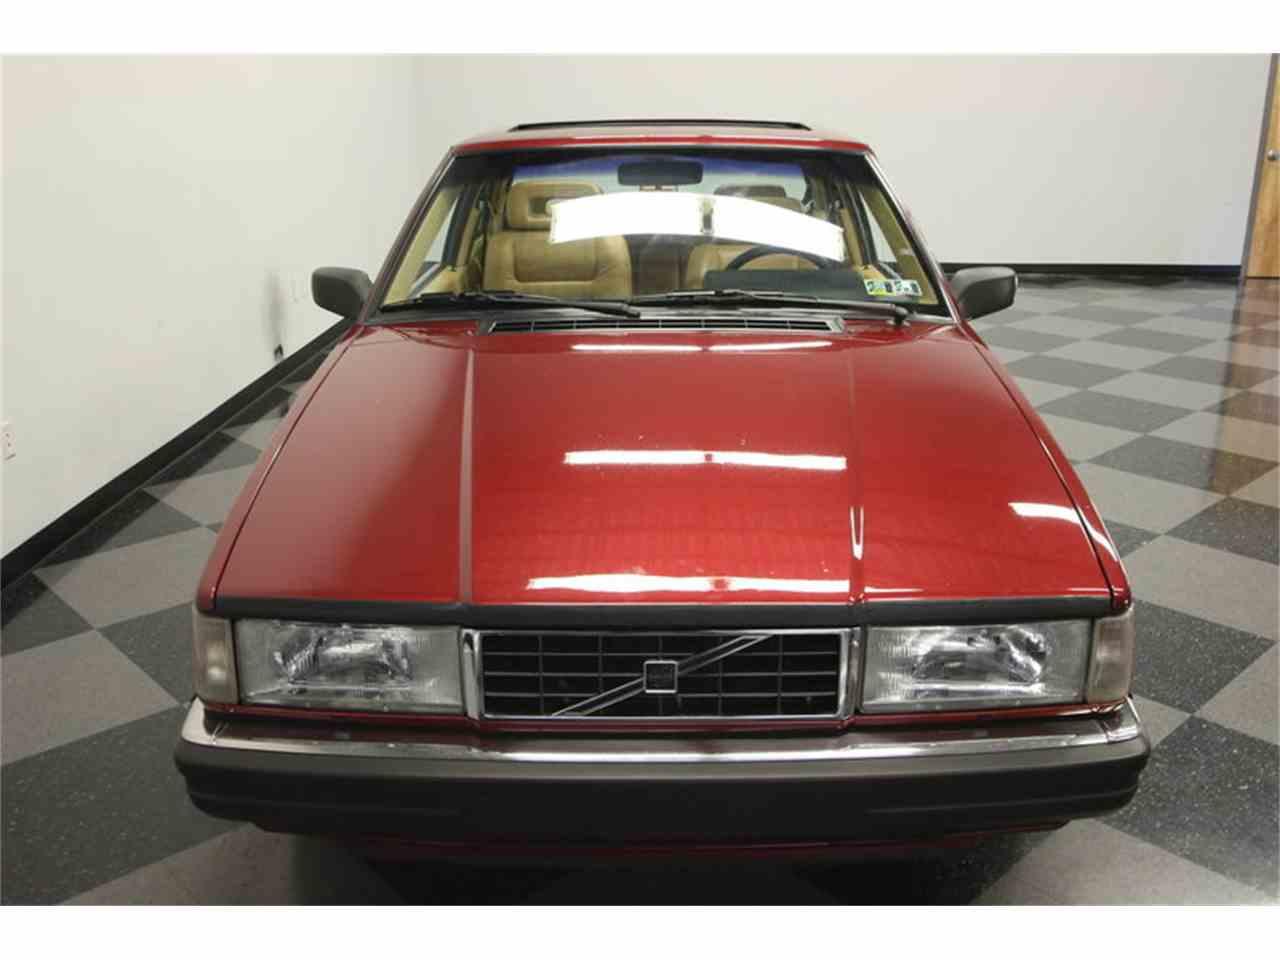 1991 Volvo Bertone 780 Turbo Coupe for Sale | ClassicCars ...